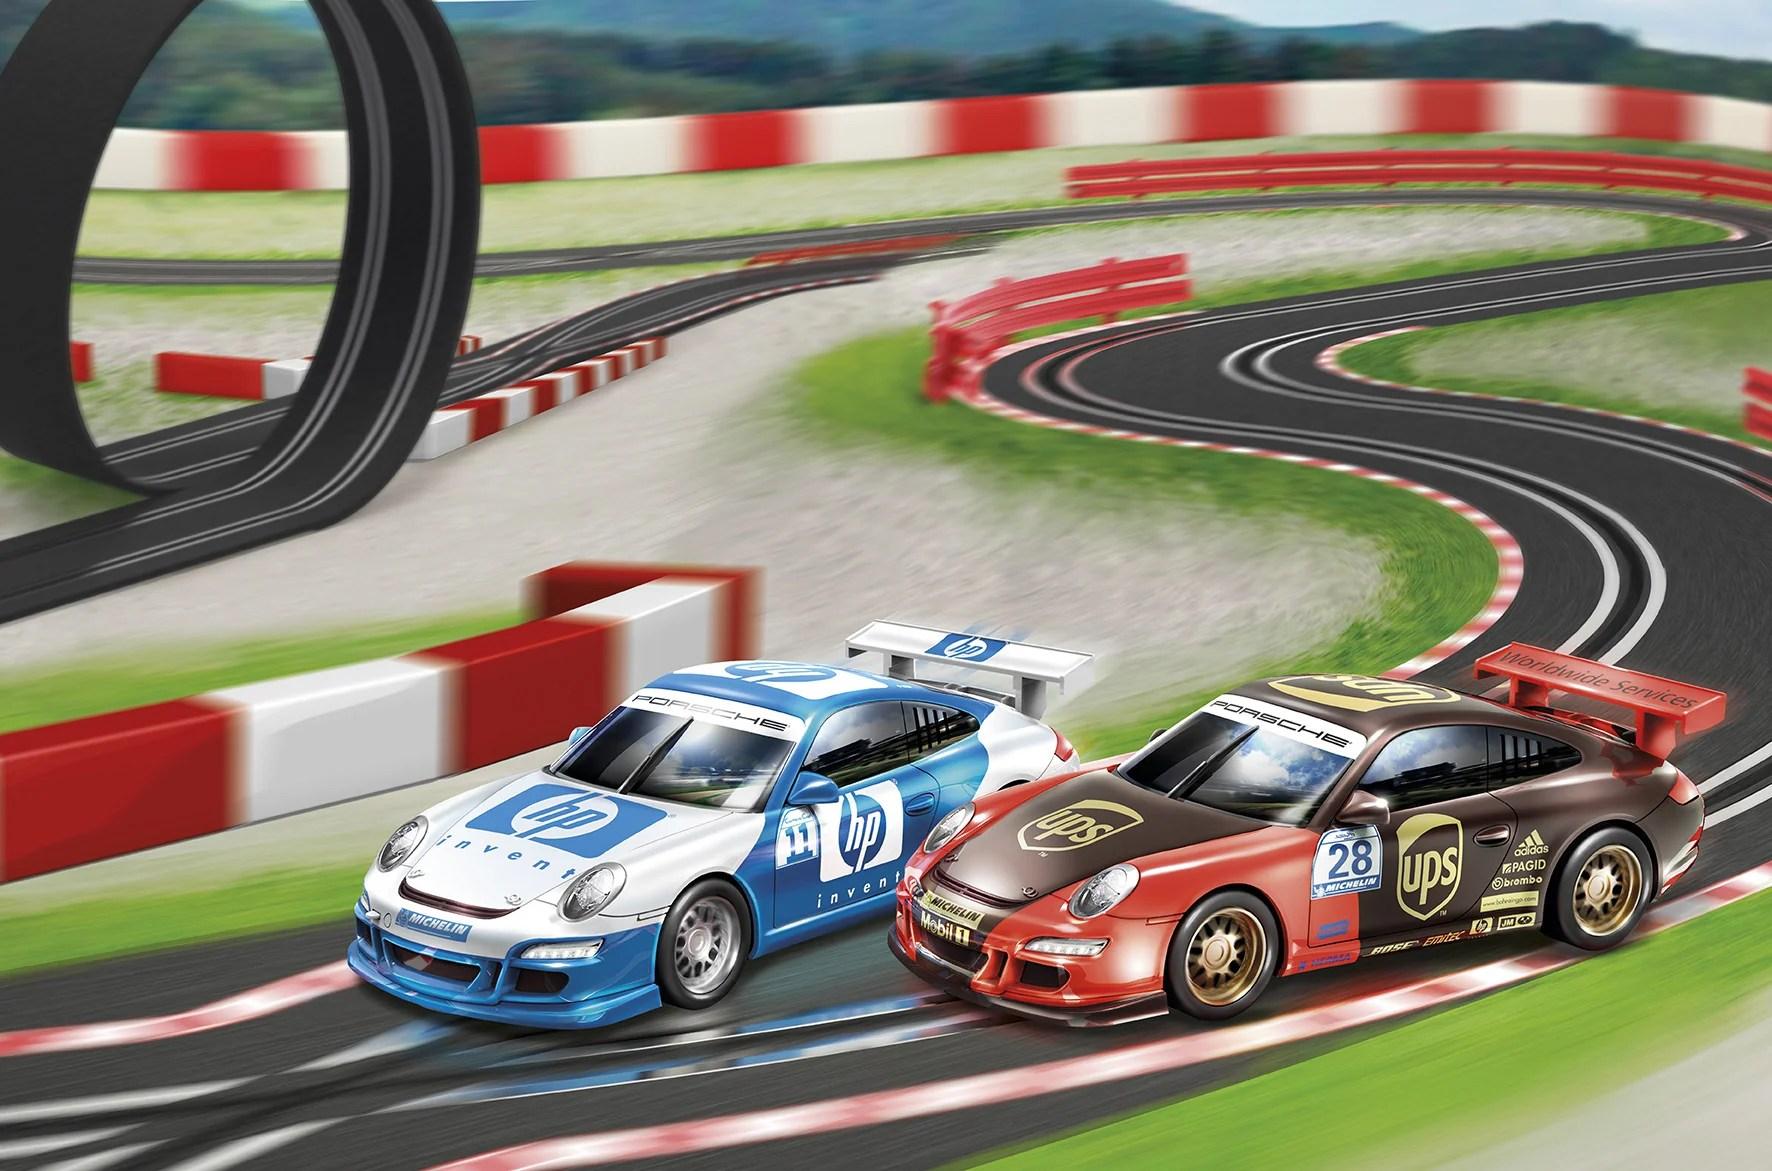 ho slot car racing slot car track power wiring [ 1772 x 1171 Pixel ]